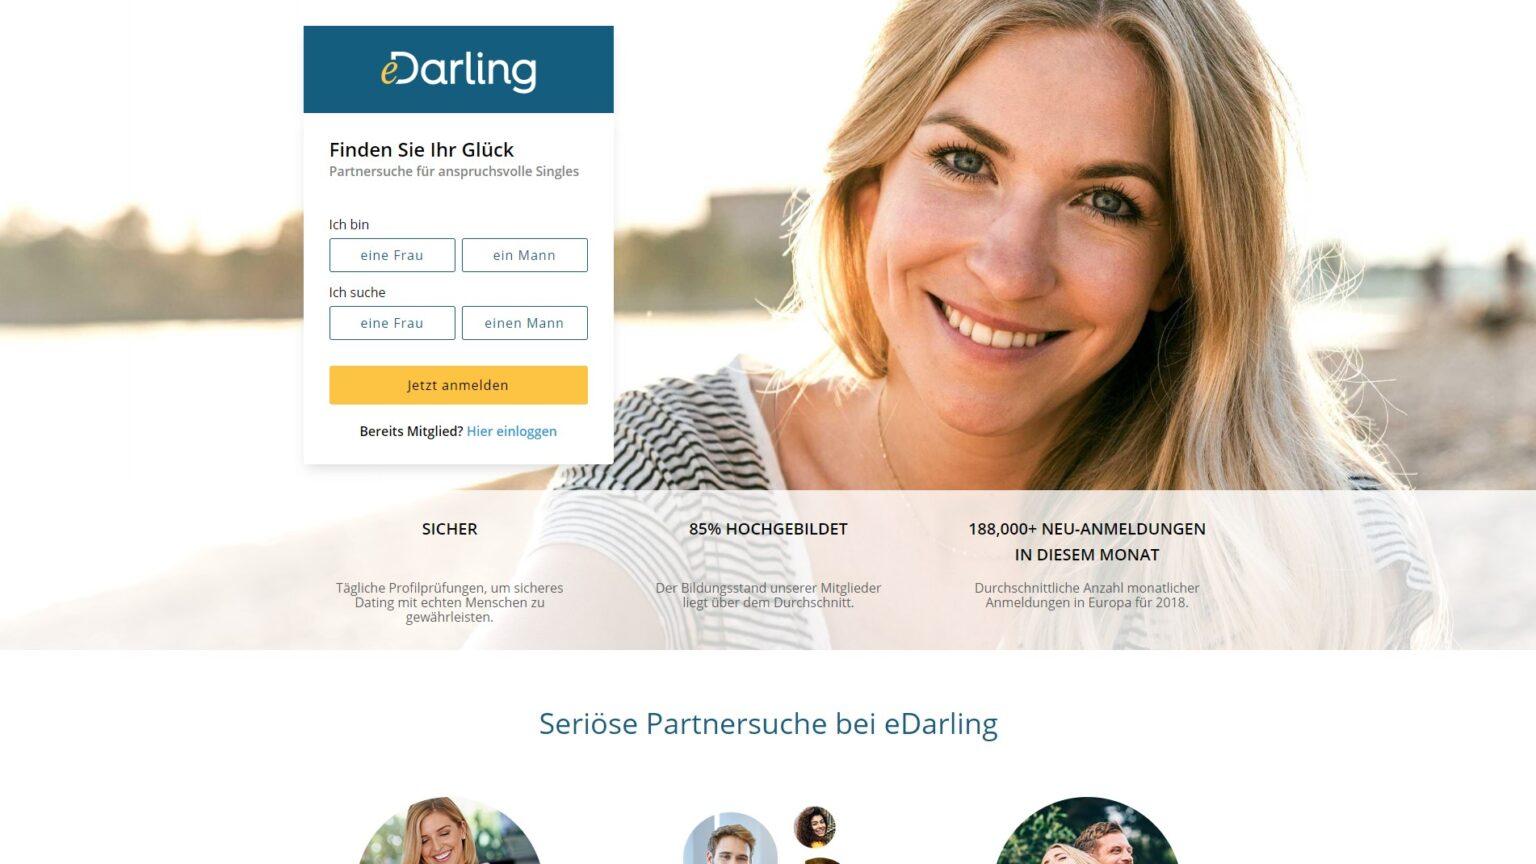 Partnervermittlung 2020